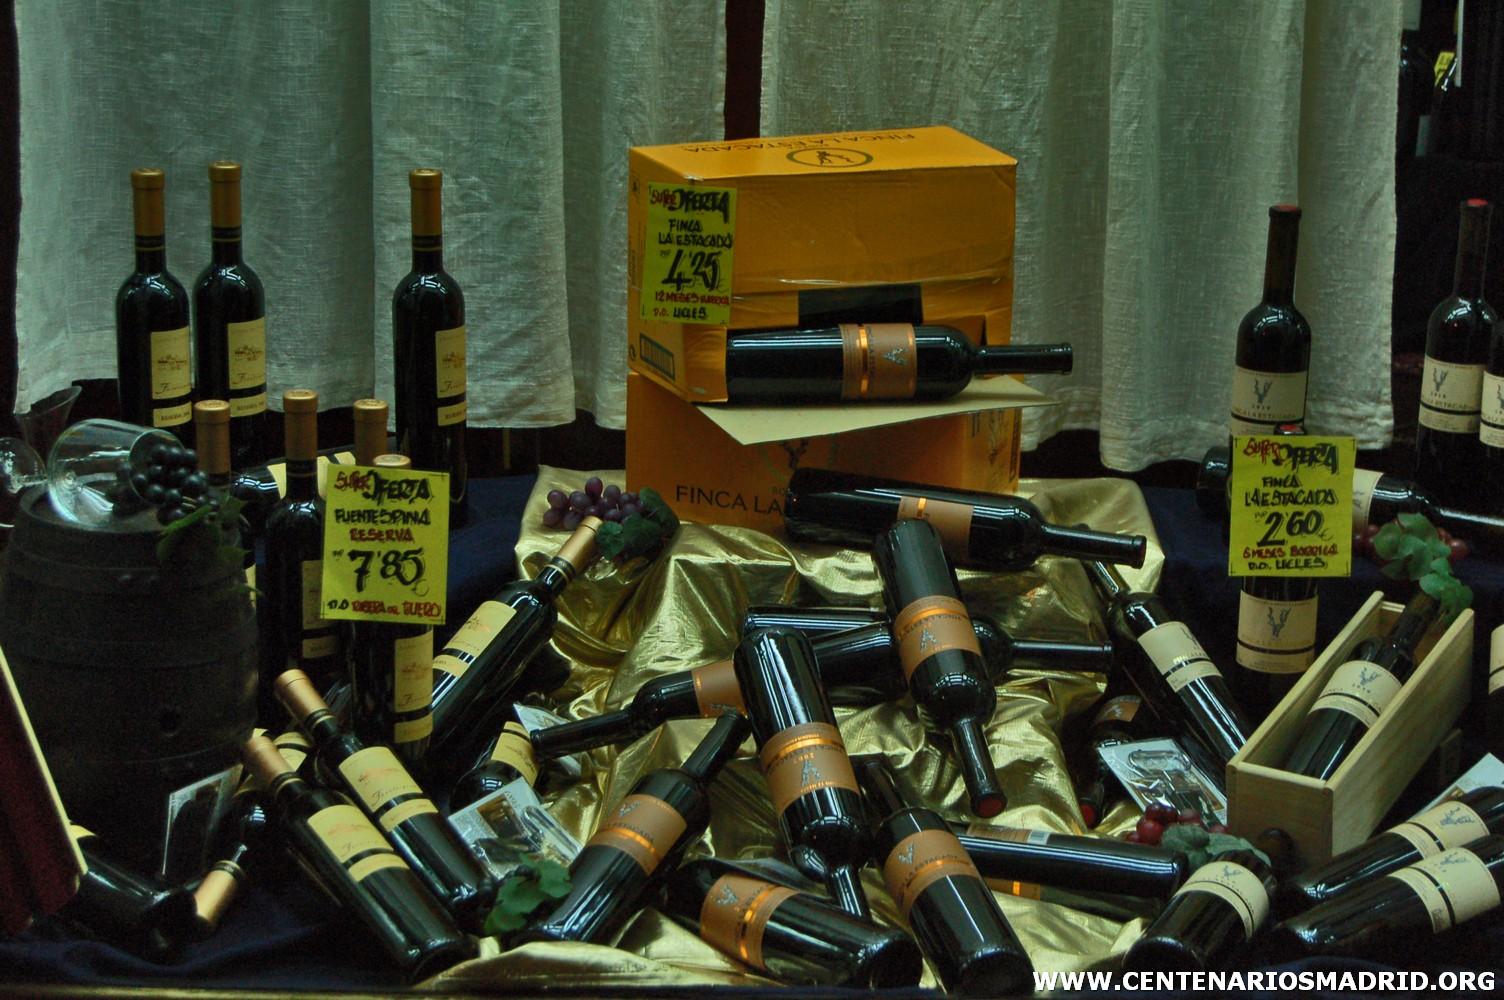 M. Madrueño vinos